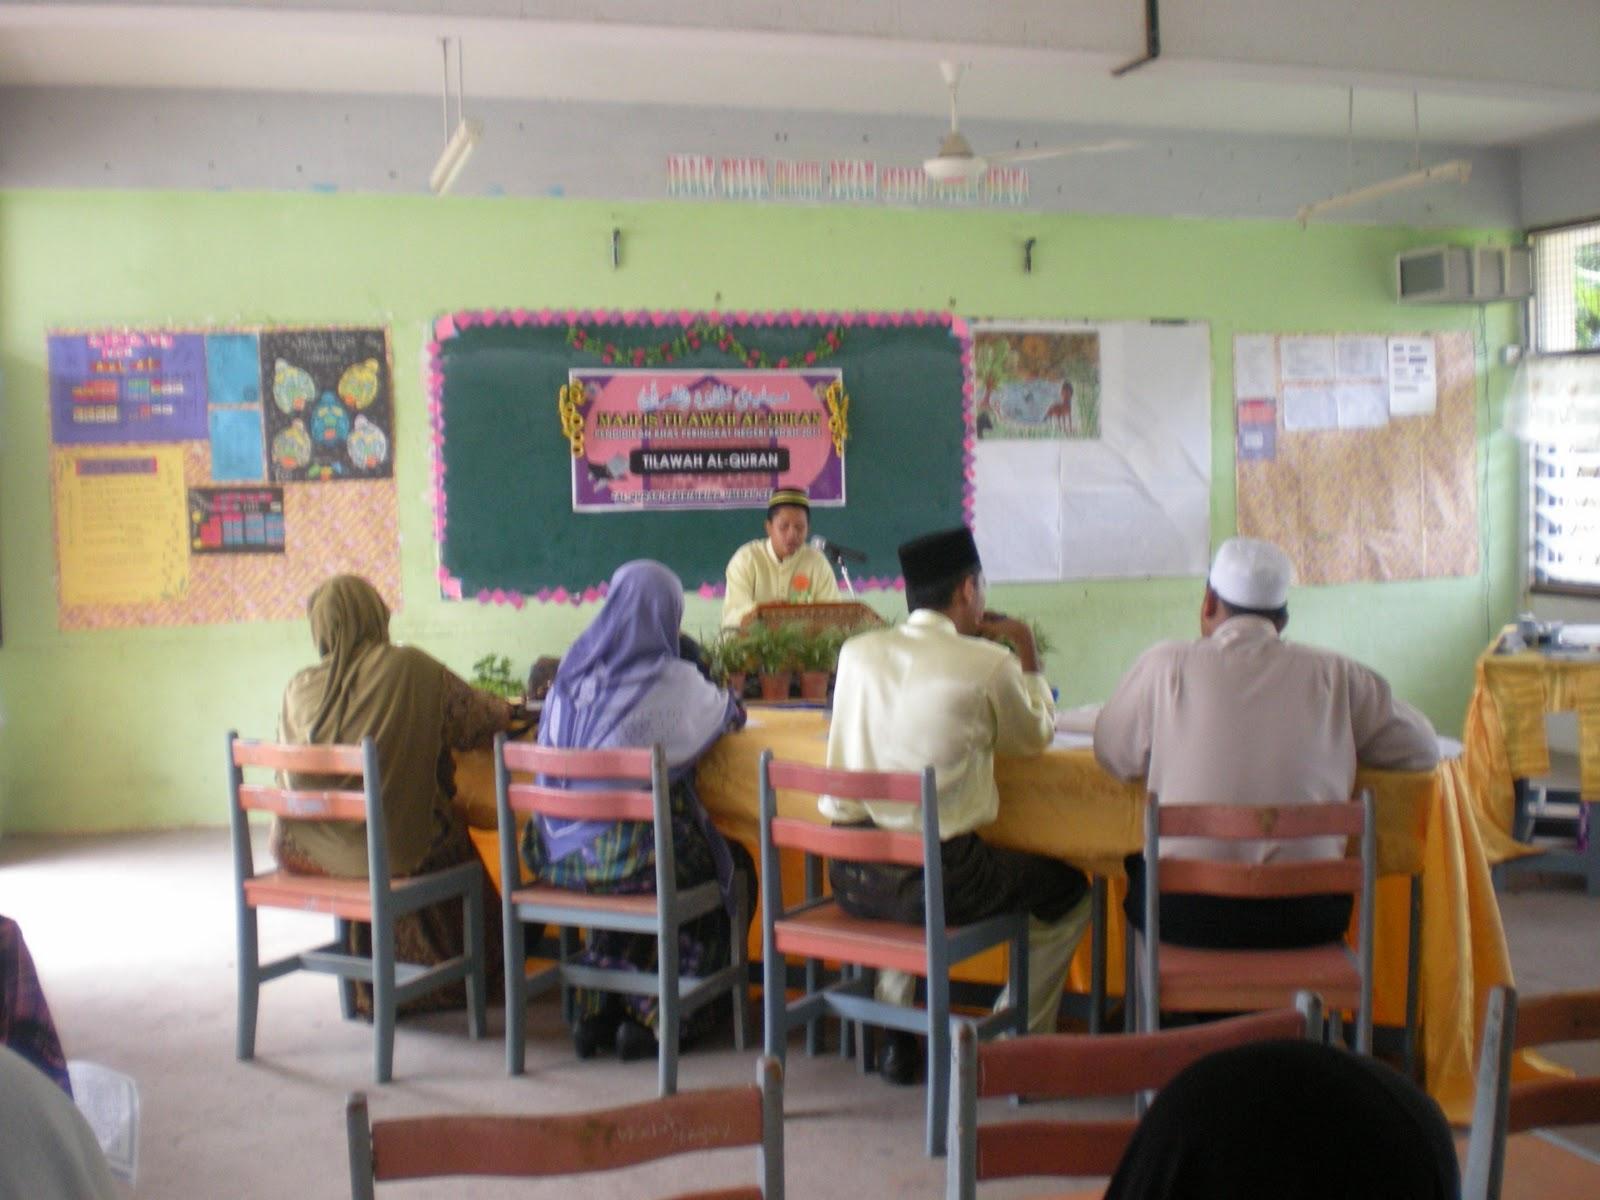 program pendidikan khas integrasi bermasalah pembelajaran